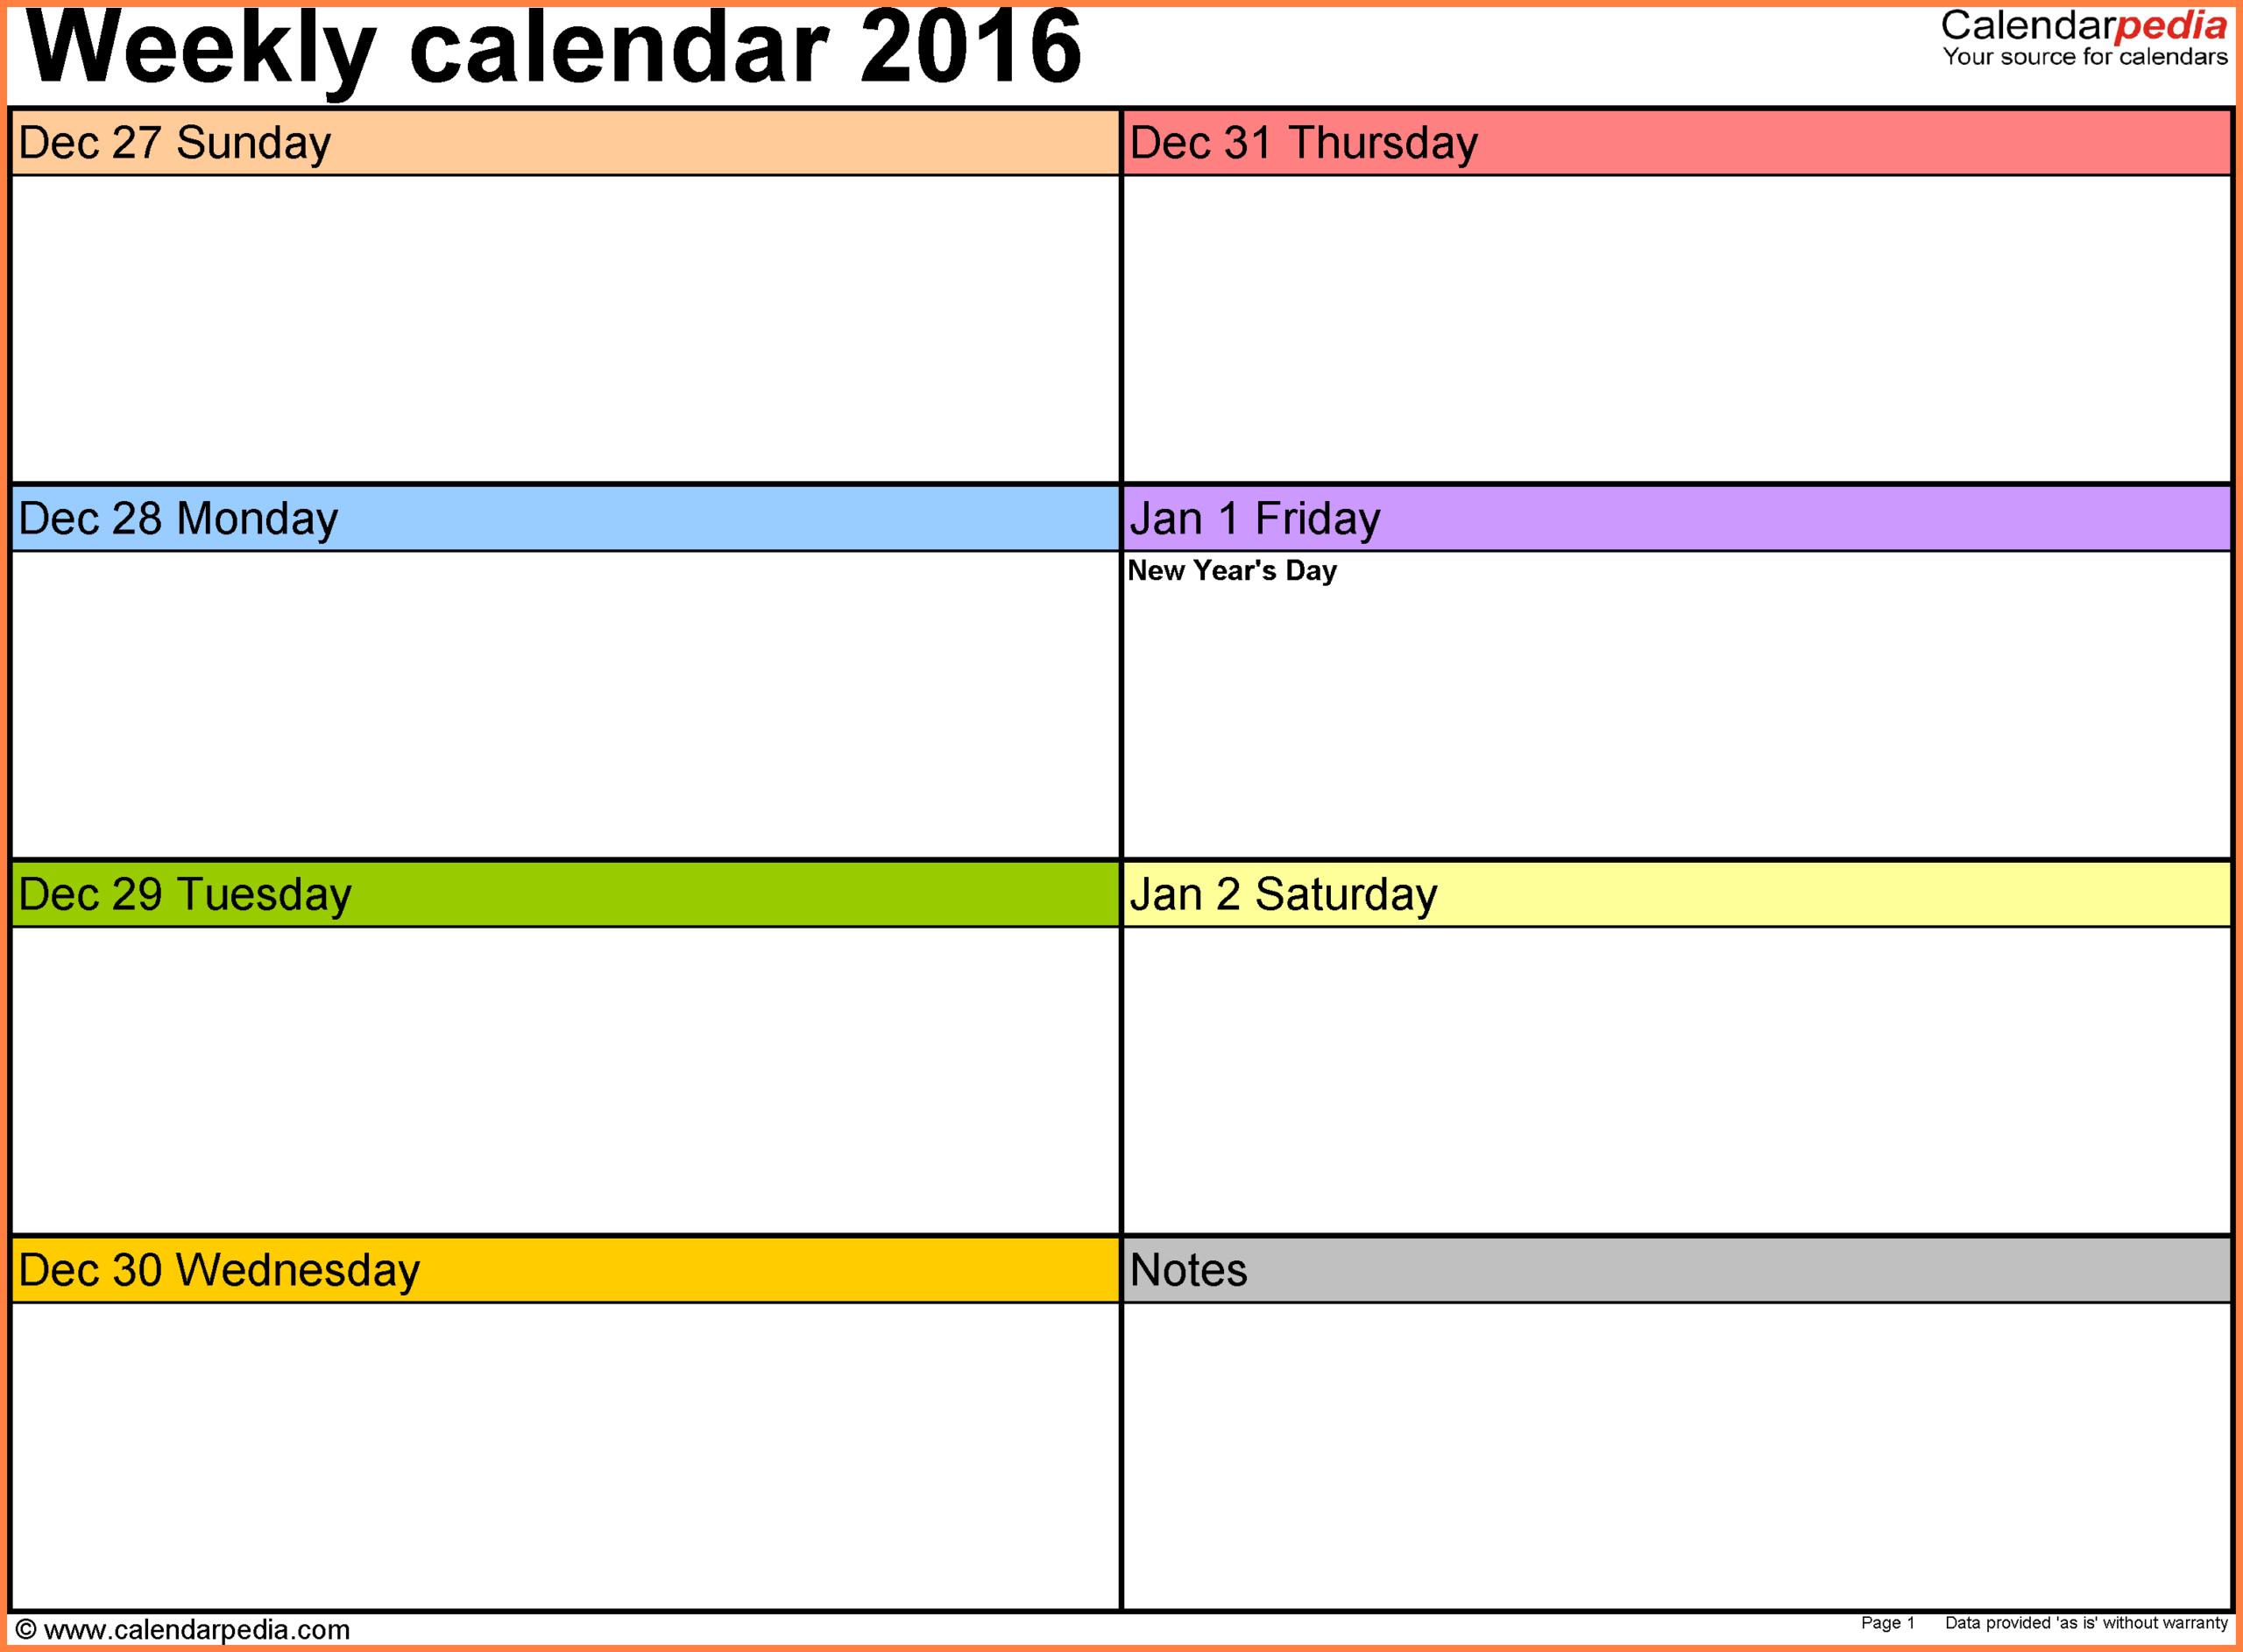 7+ Weekly Calendar Template Word - Marital Settlements